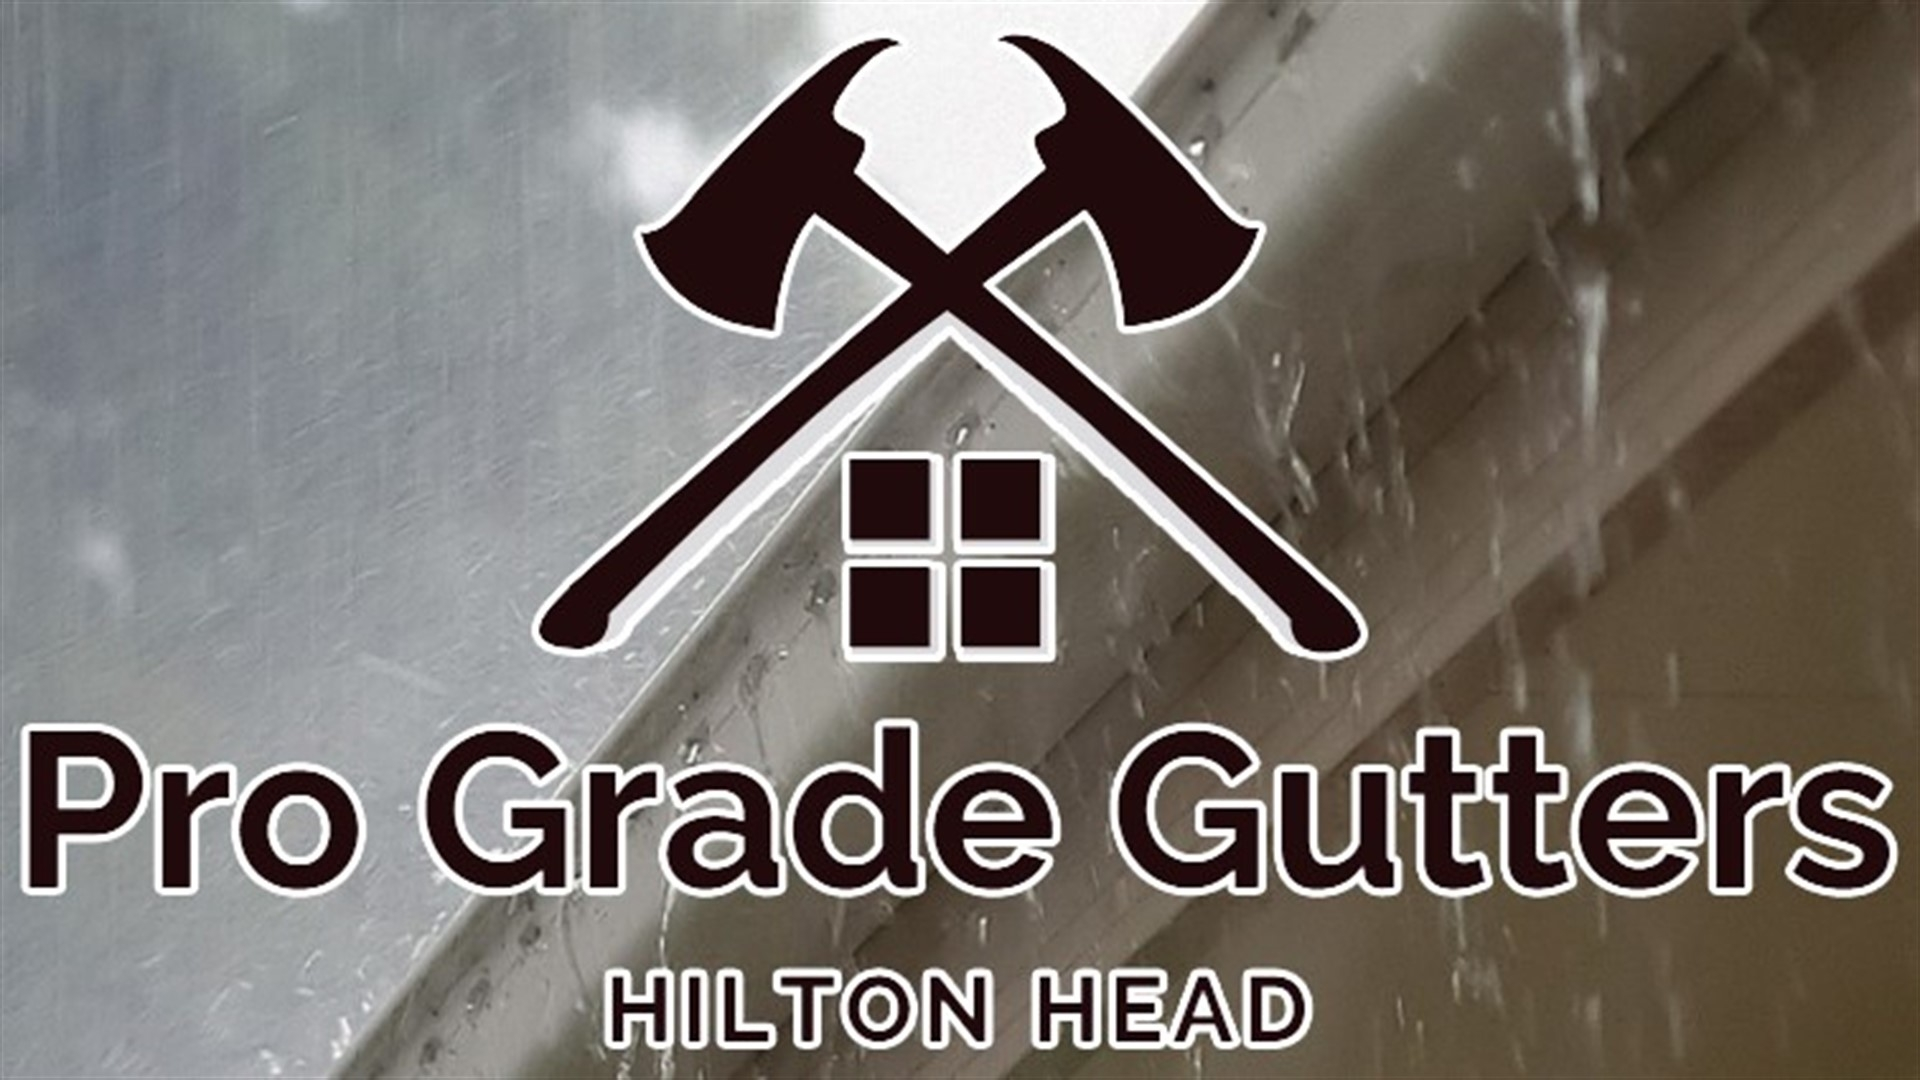 Hilton Head Gutter Pros (@hiltonheadgutterpros) Cover Image